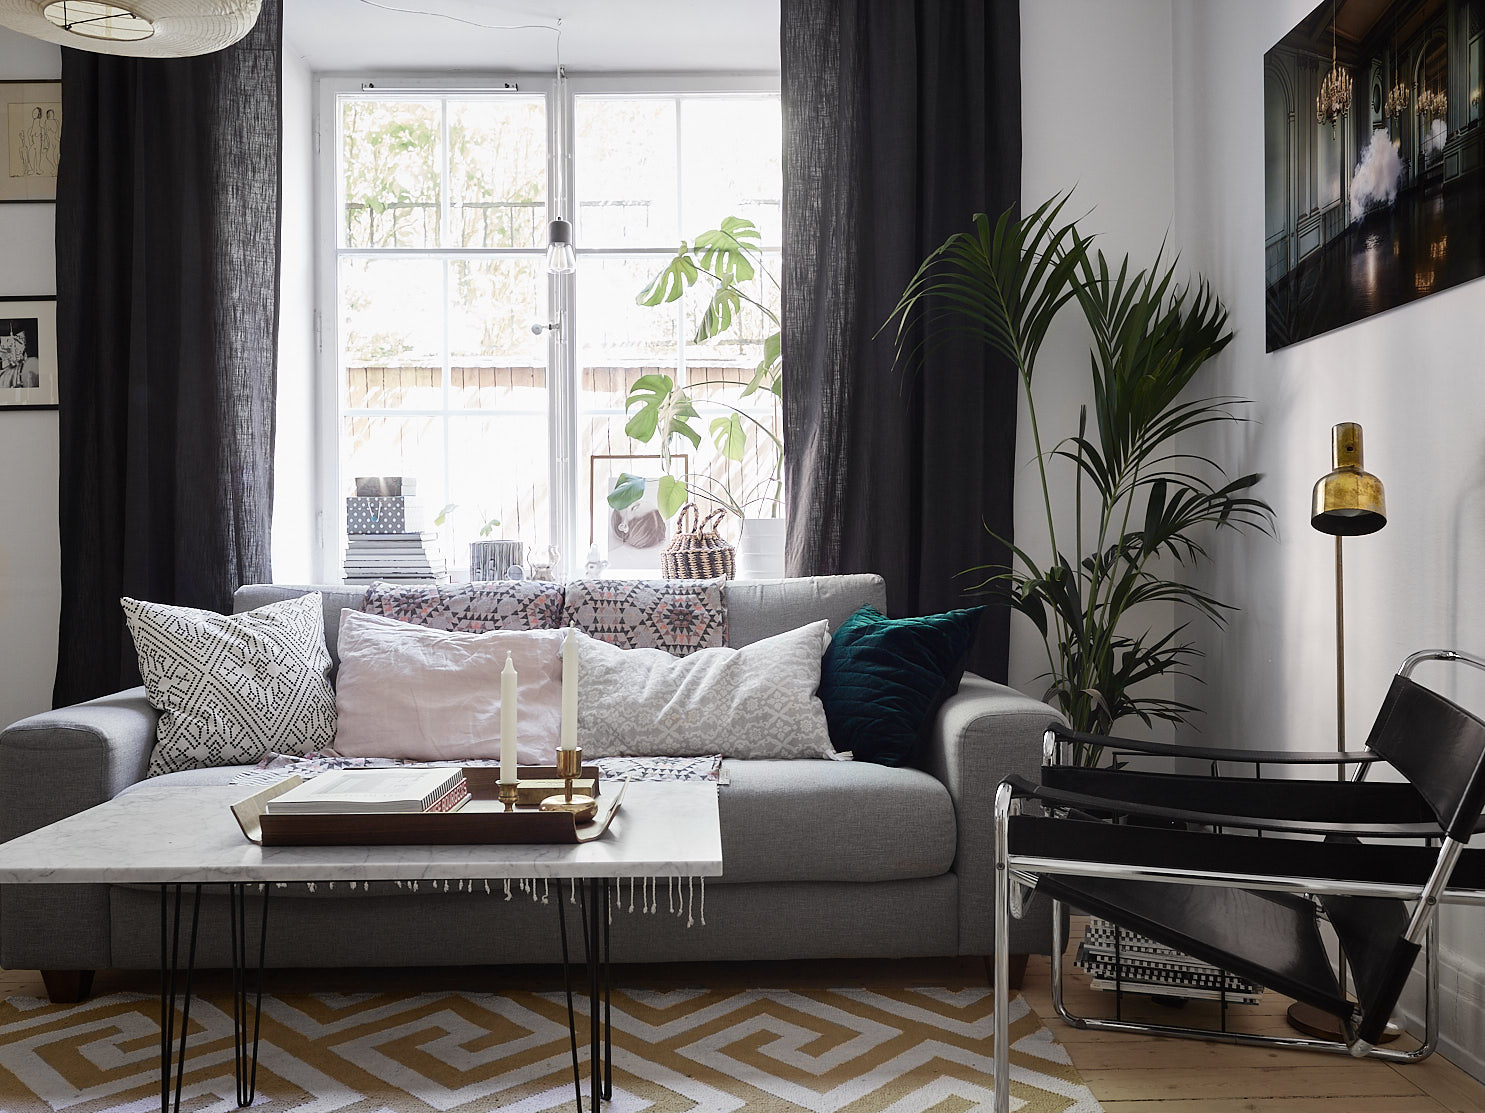 диван подушки кресло столик ковер окно подоконник цветок